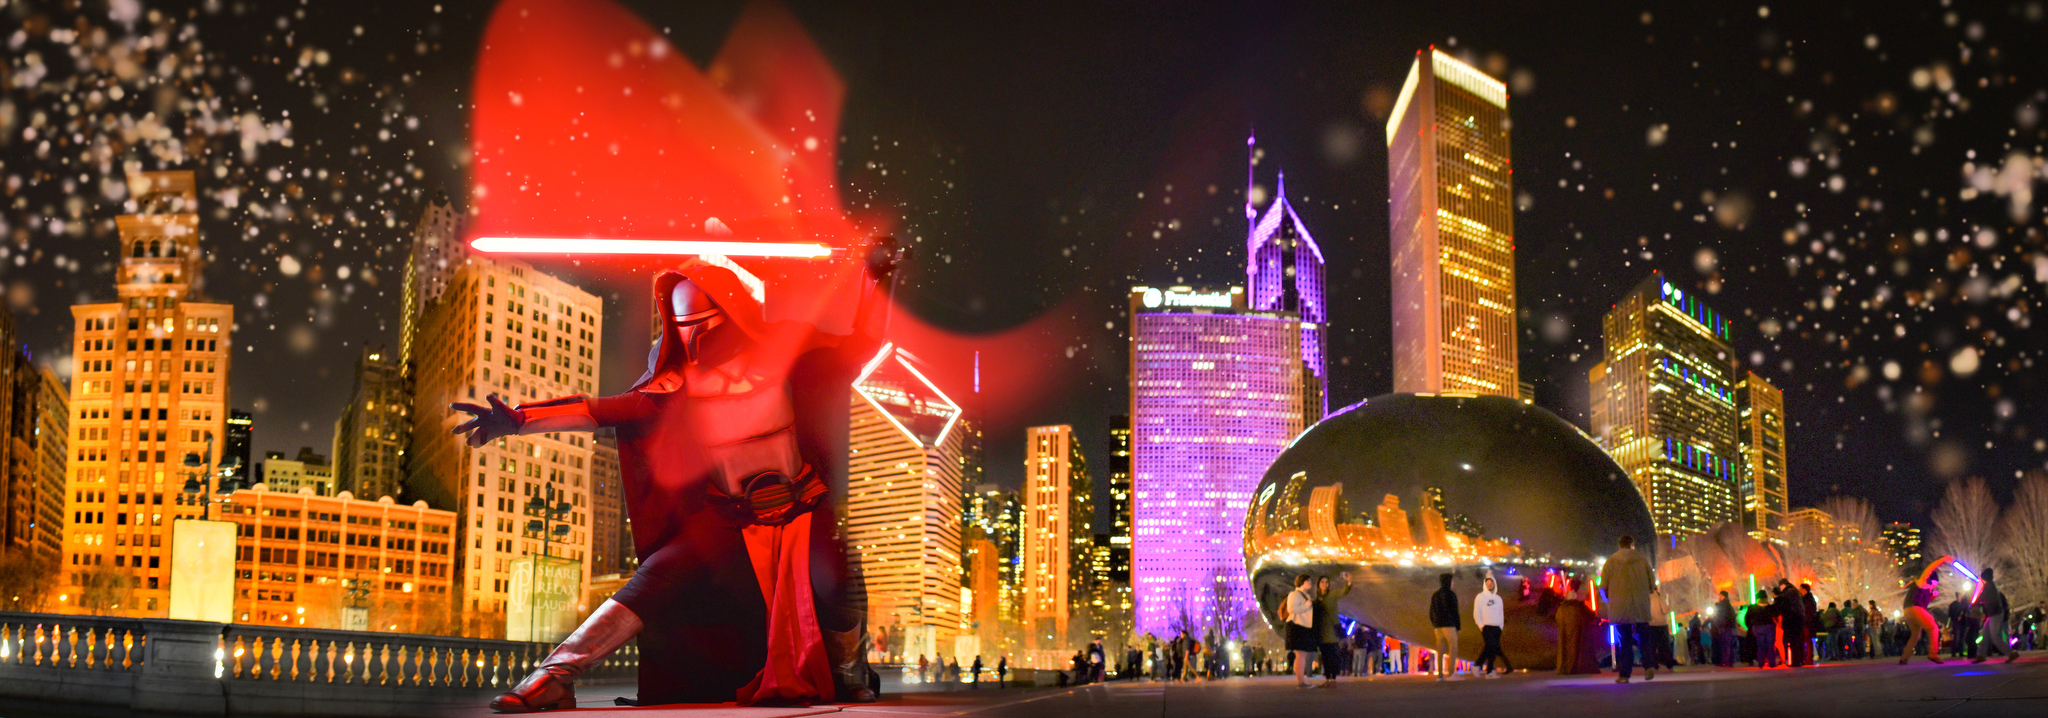 2019.04.14 - Star Wars Celebration Chicago 288851.JPG